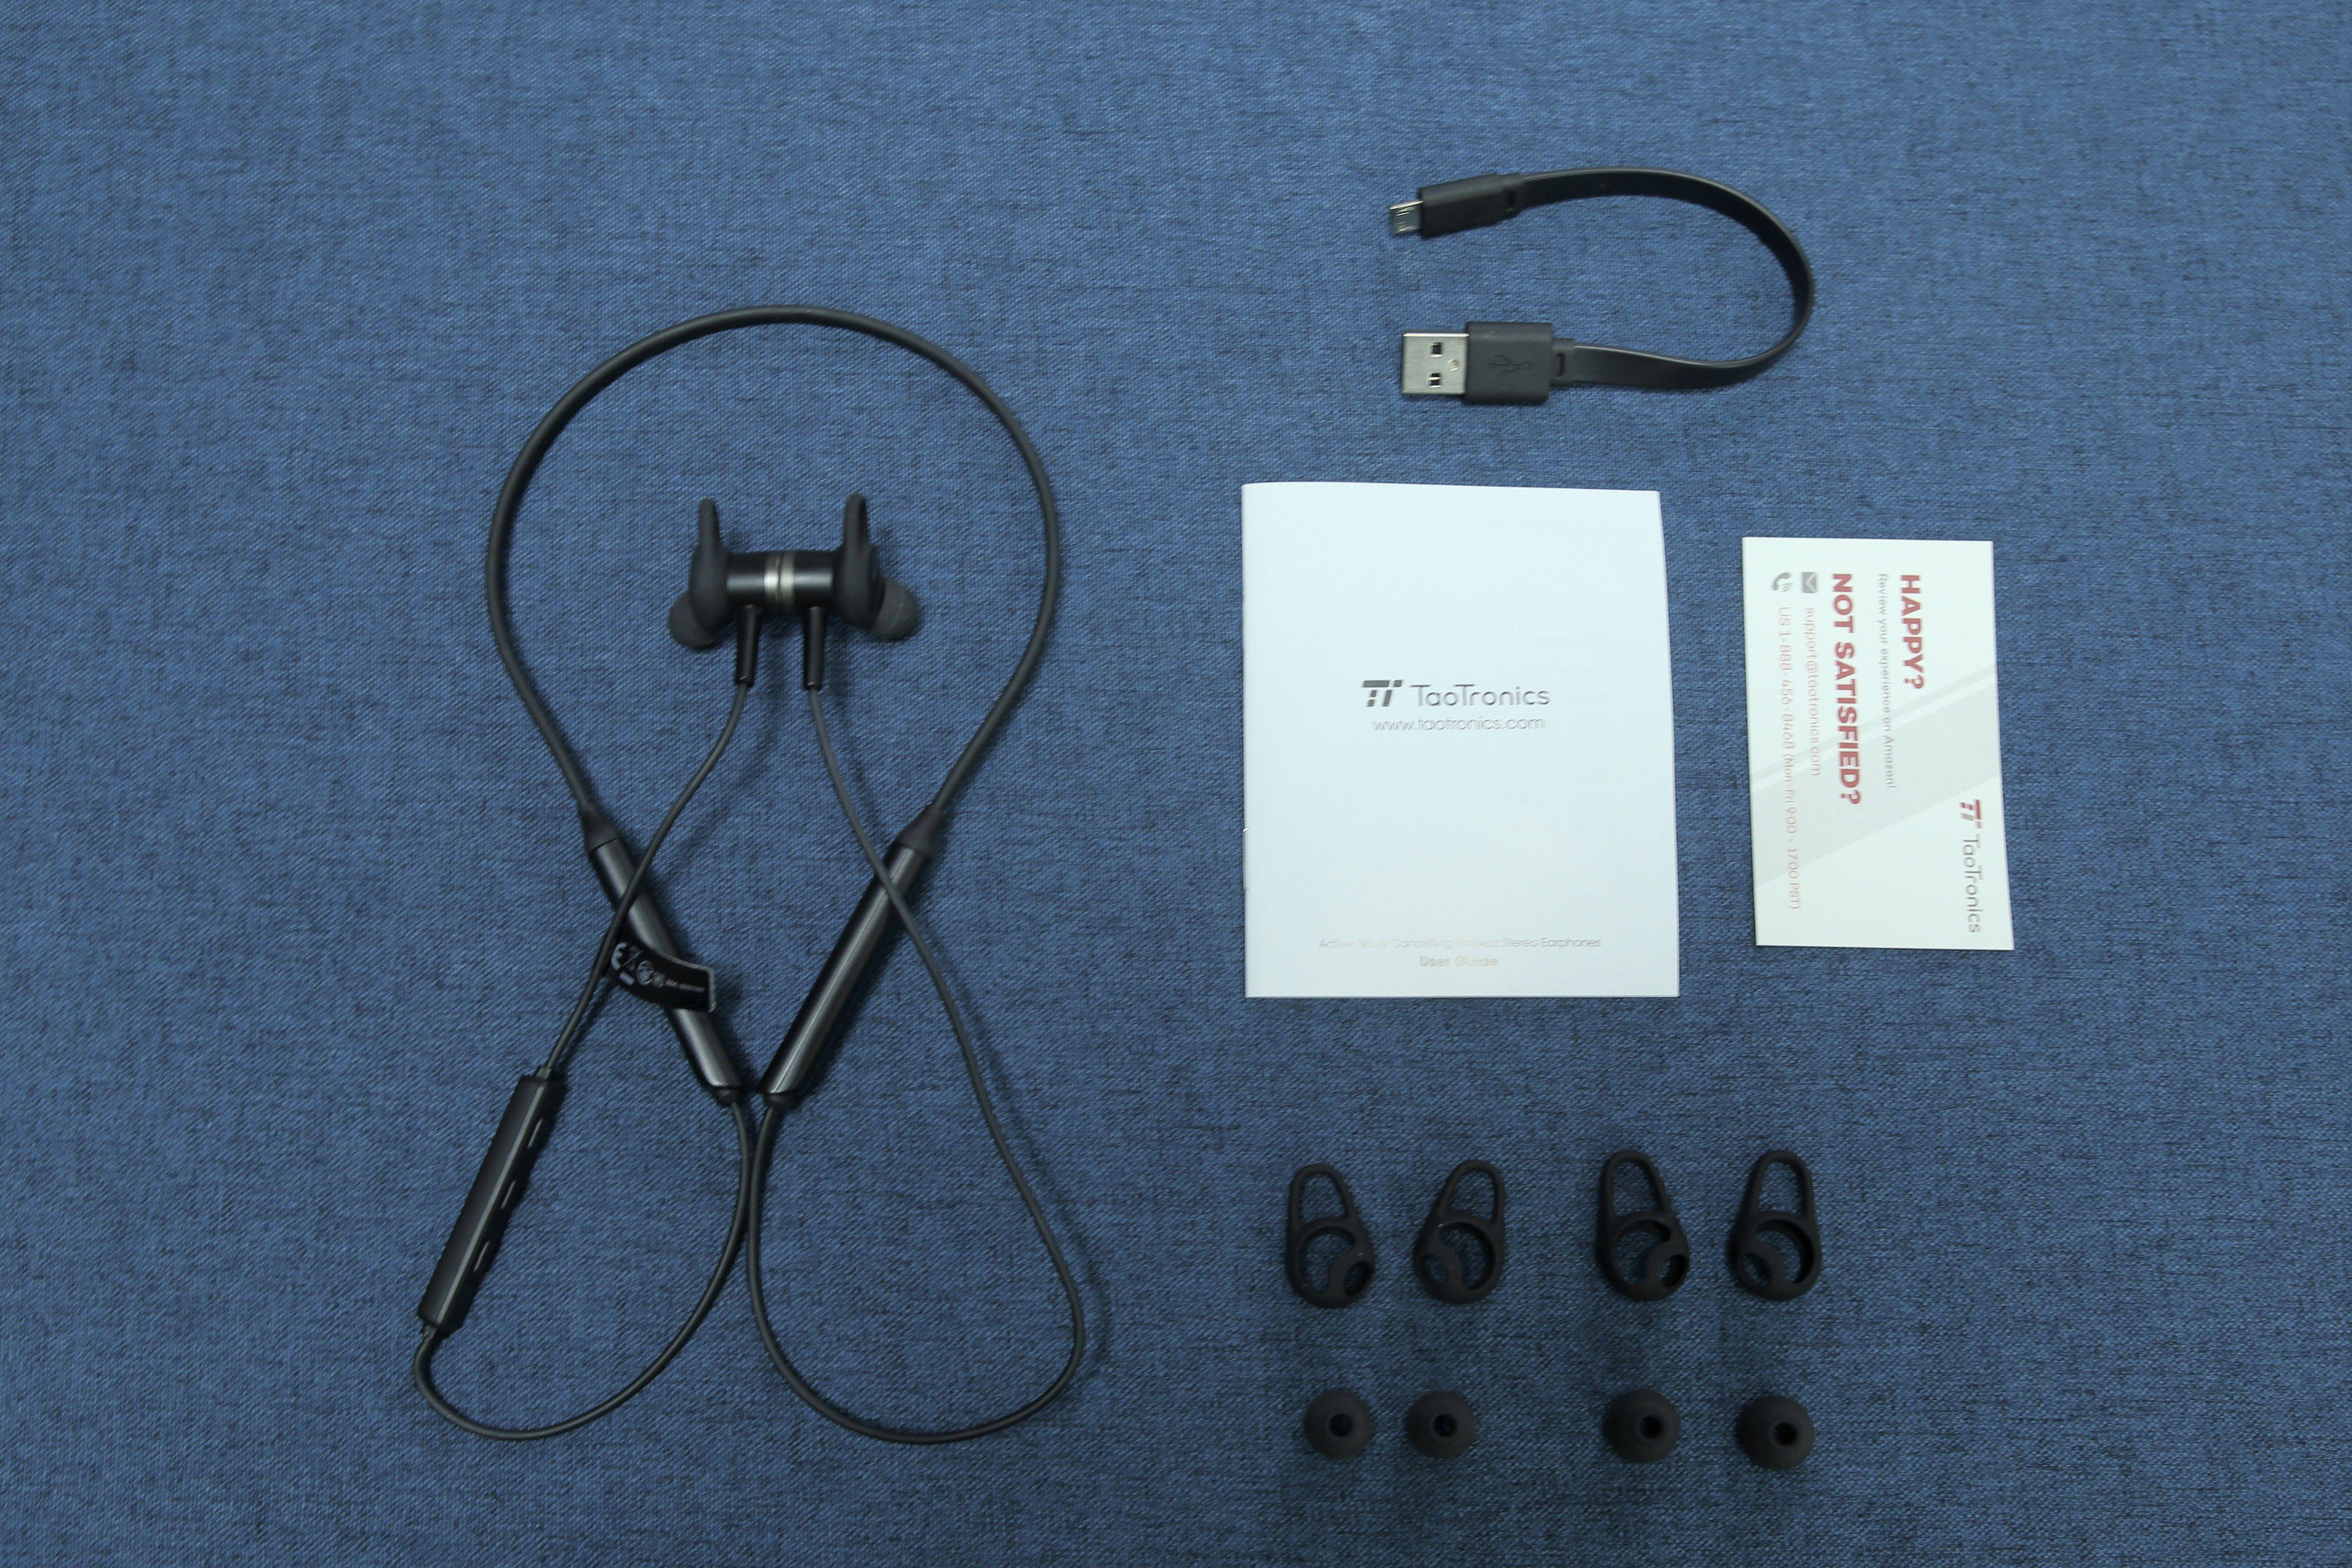 TaoTronics TT-BH042頸掛式降噪藍牙耳機 - 盒內配件